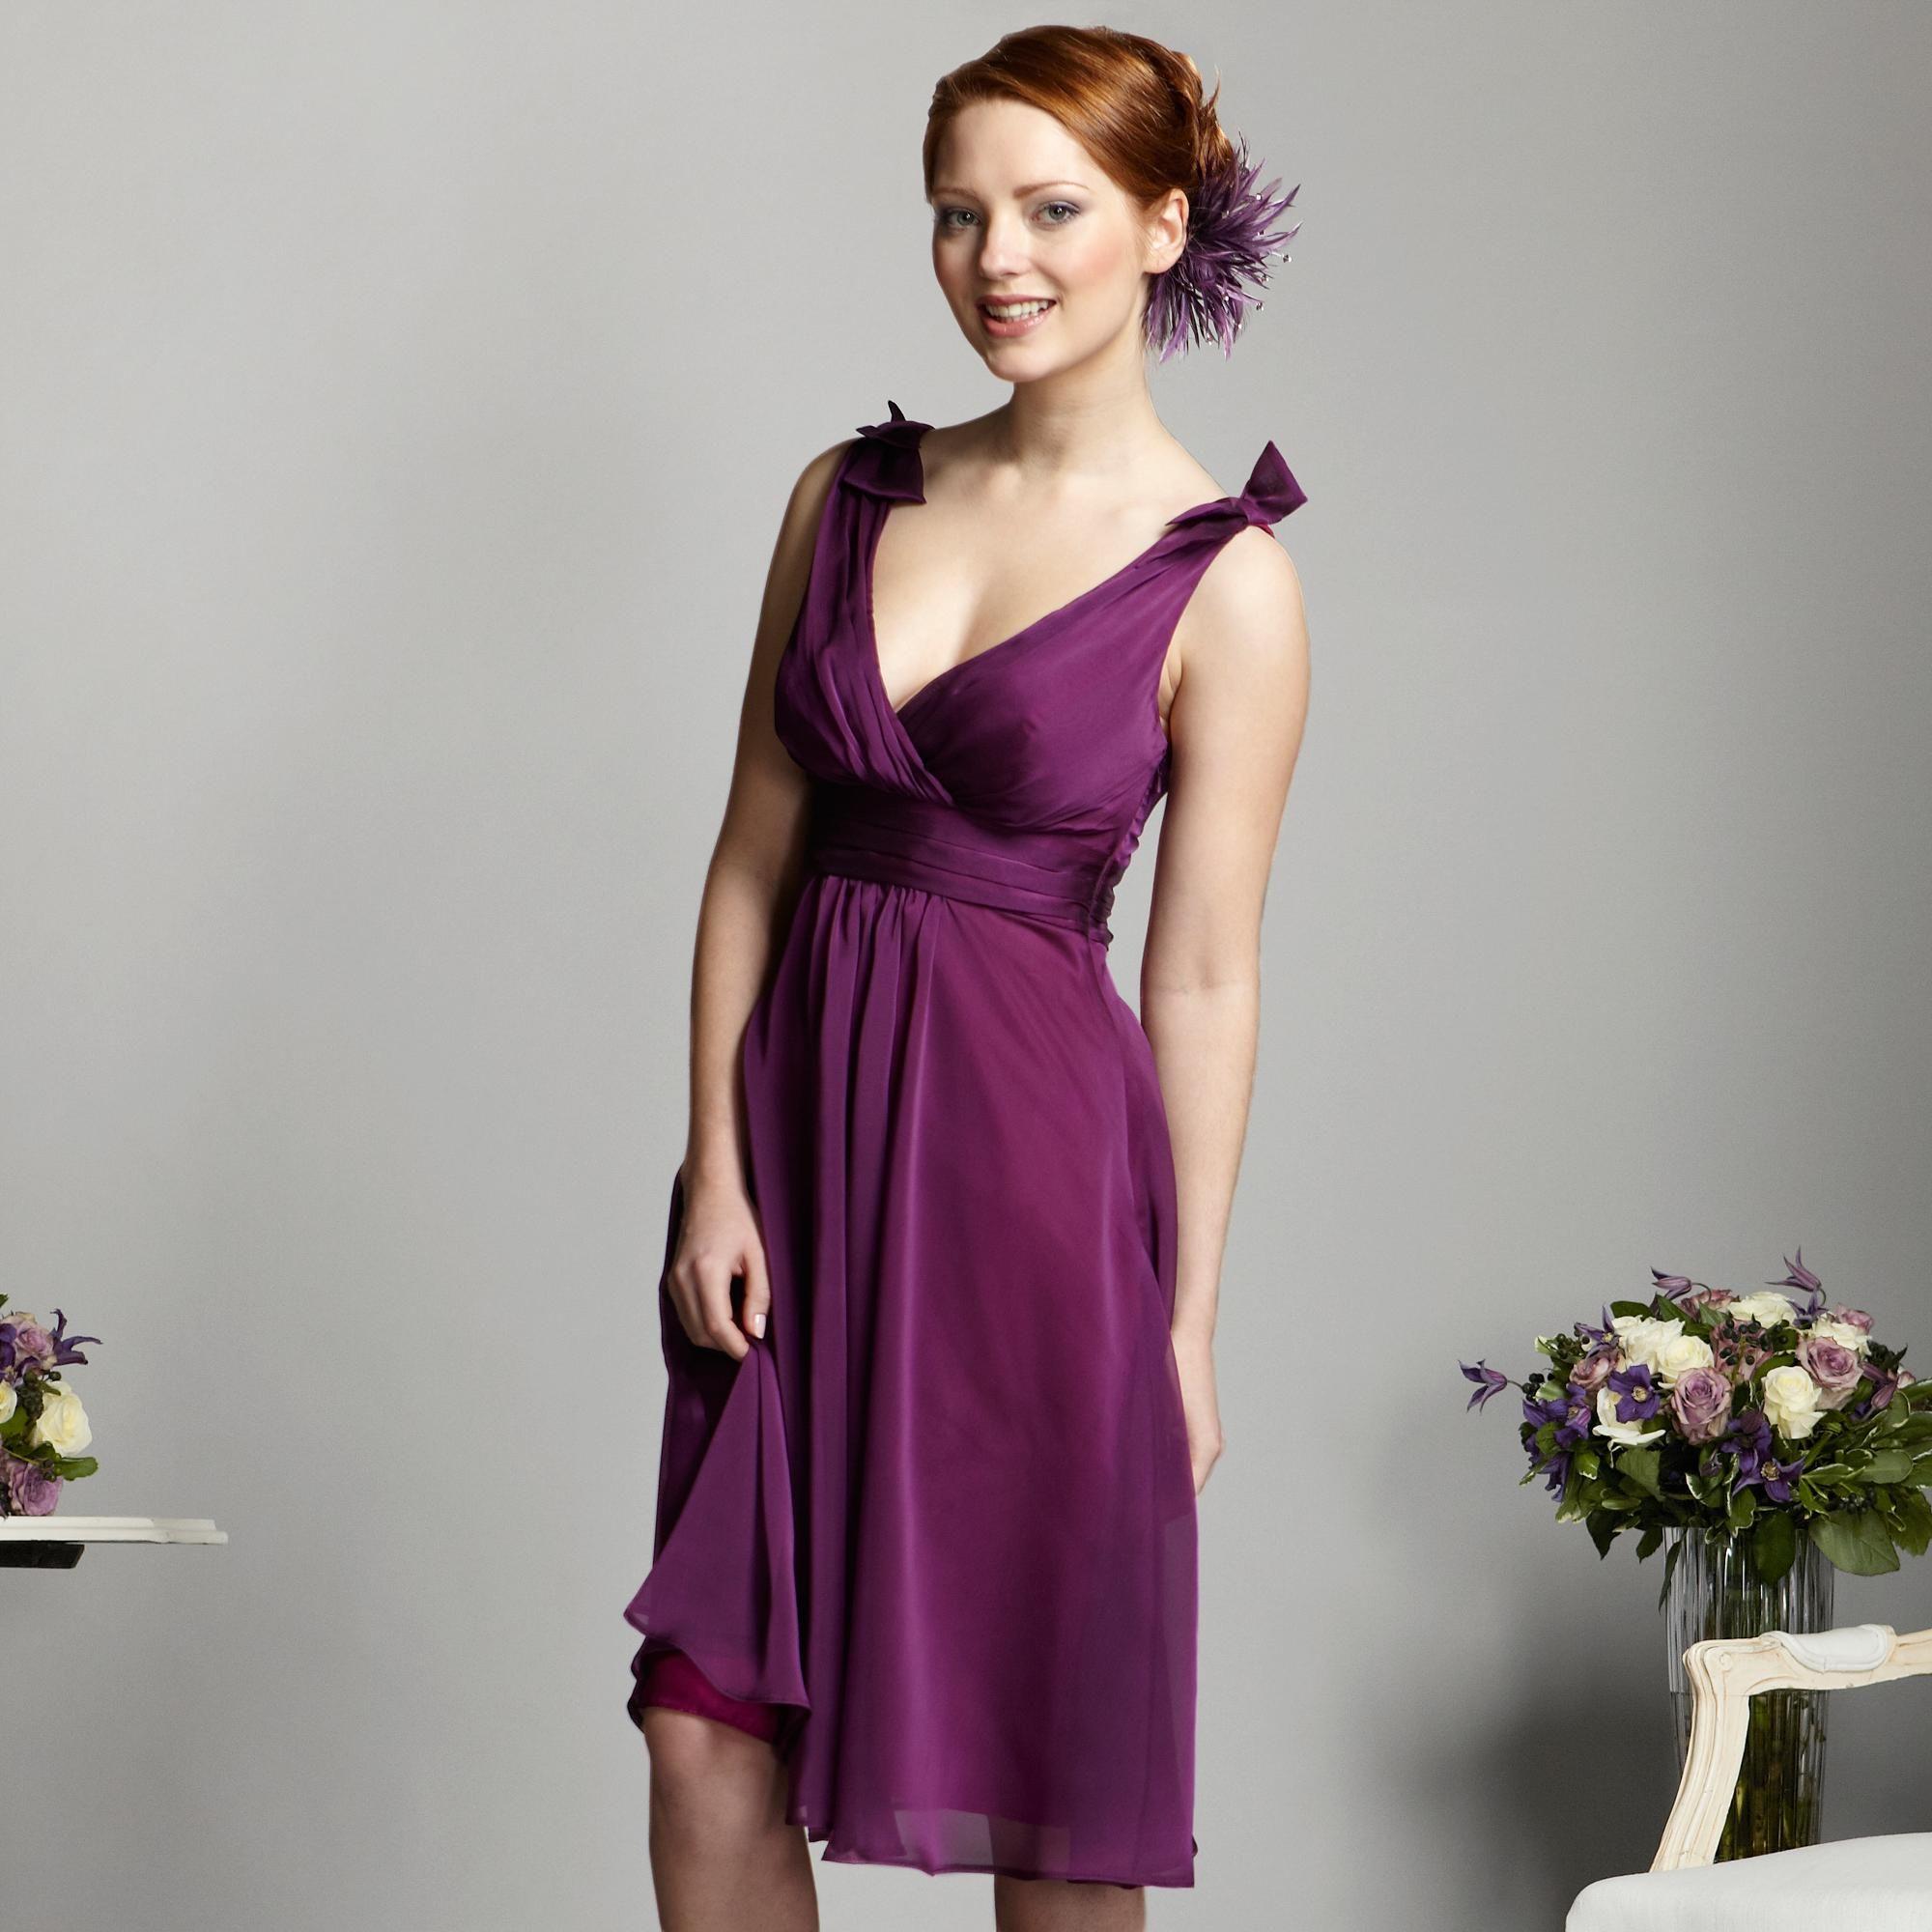 Brautjungfernkleider debenhams purple wedding inspirations debenhams plum built up strap prom dress bridesmaid dresses dresses women ombrellifo Choice Image